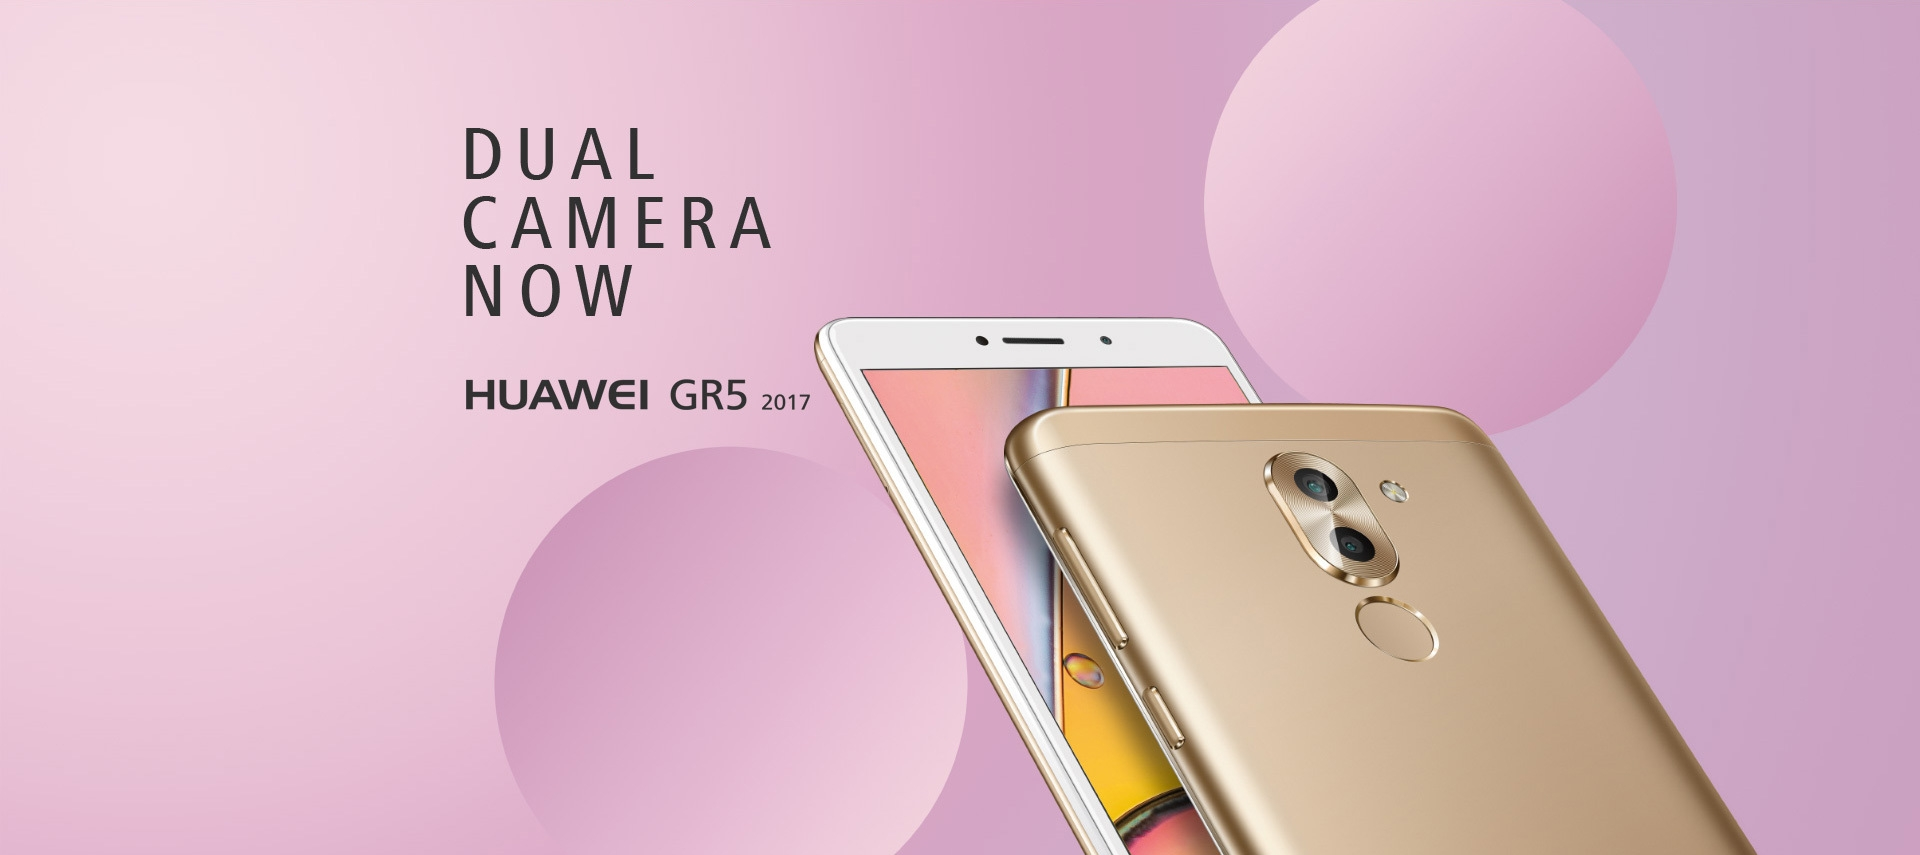 Huawei GR5 2017 smartphone